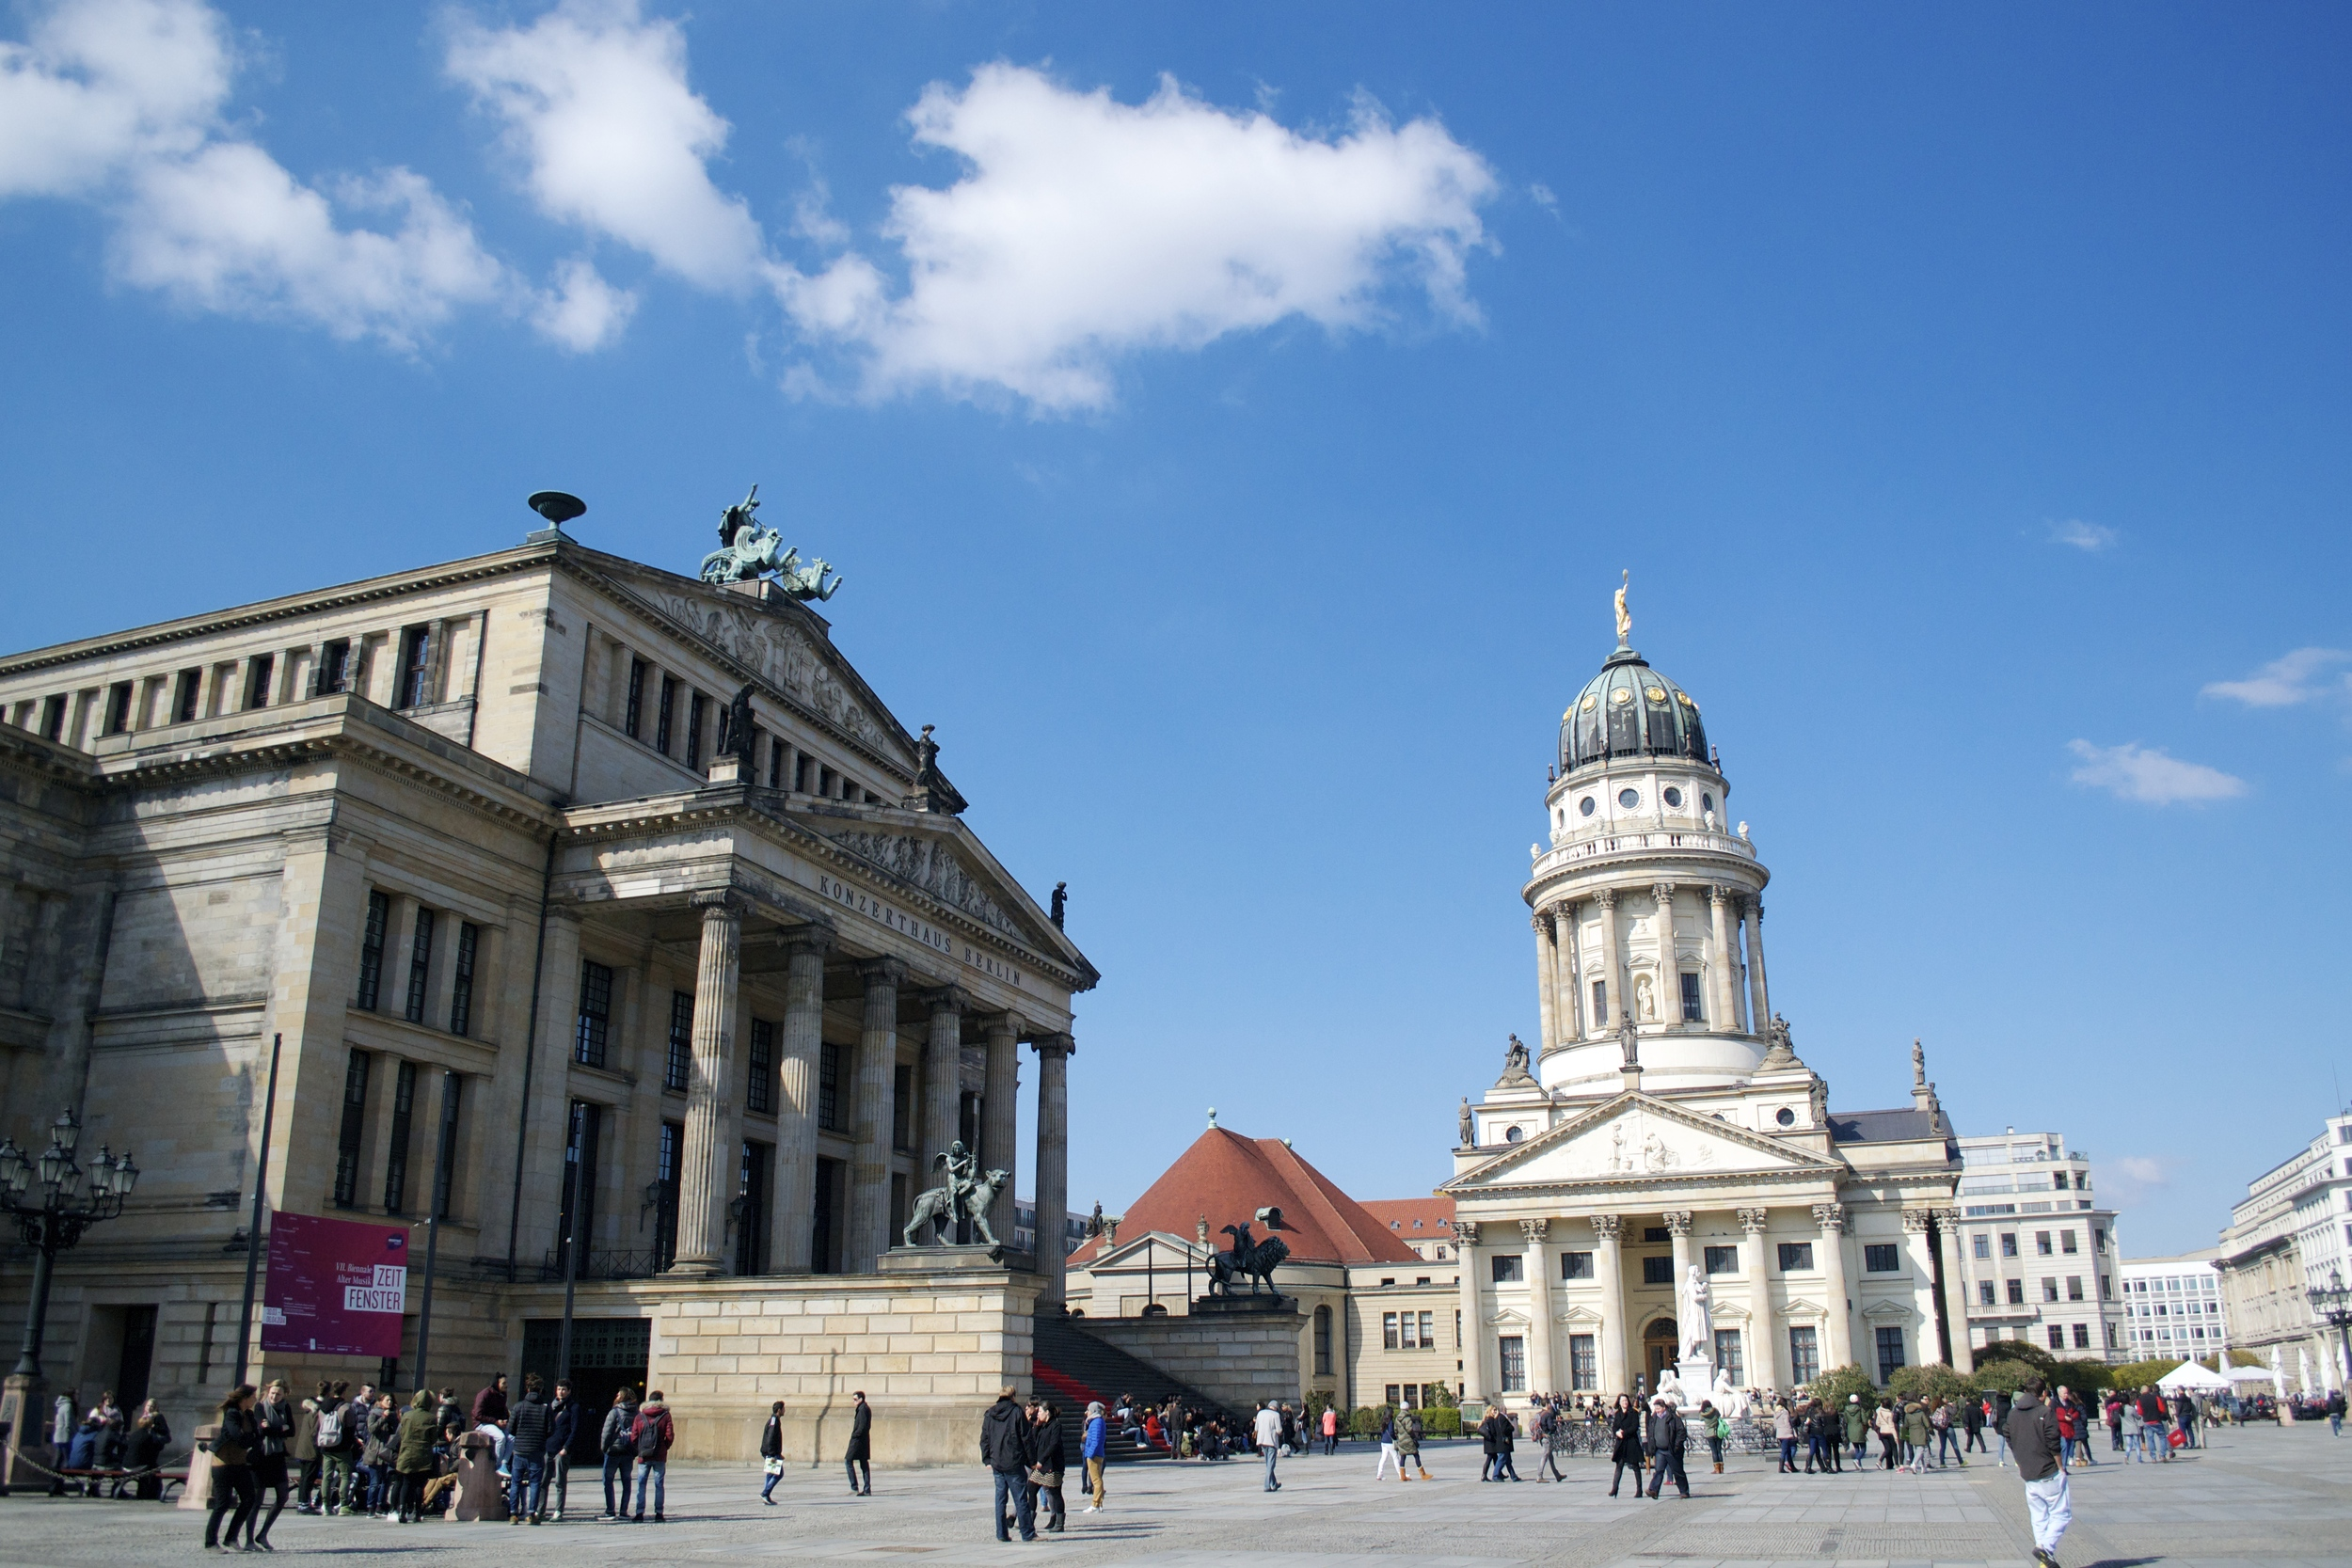 The Gendarmenmarkt on a beautiful sunny day.